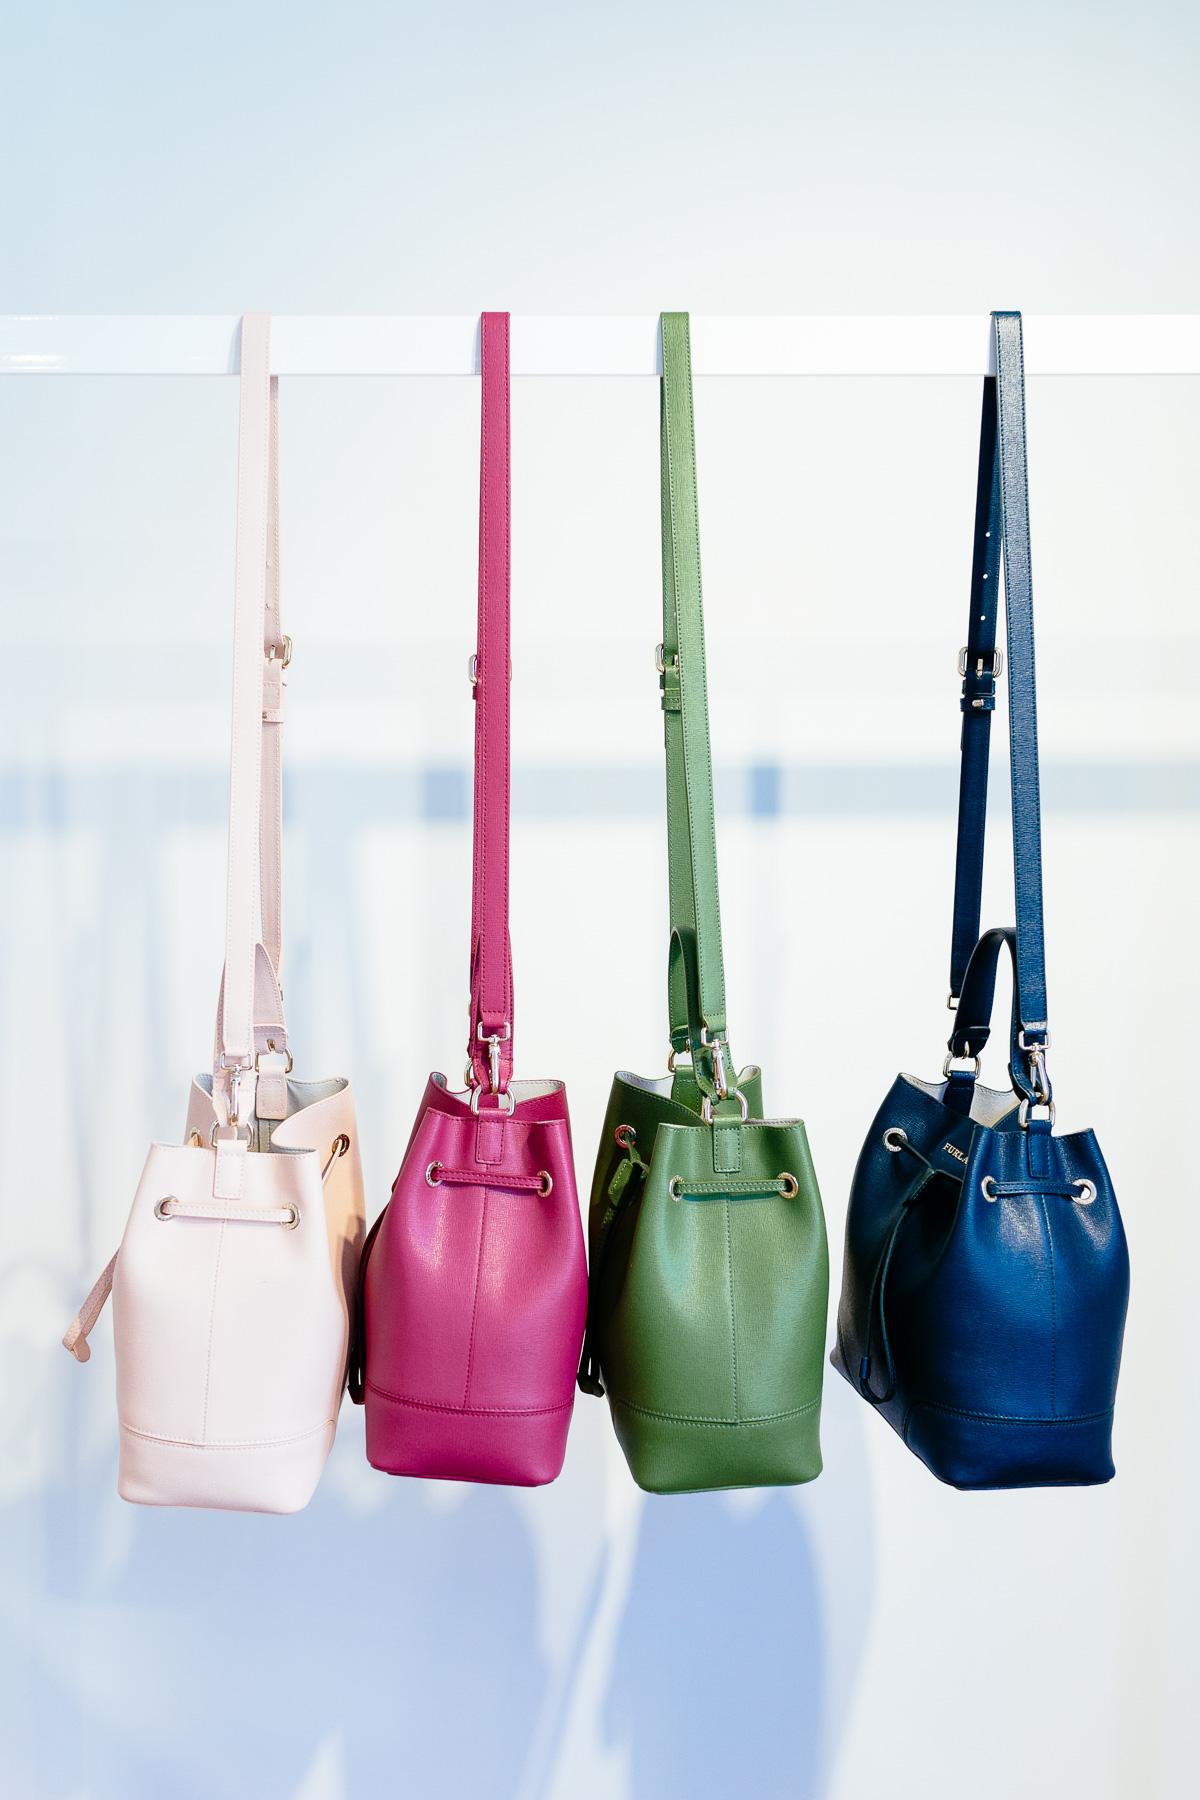 Furla Fall 2016 Bags (7)